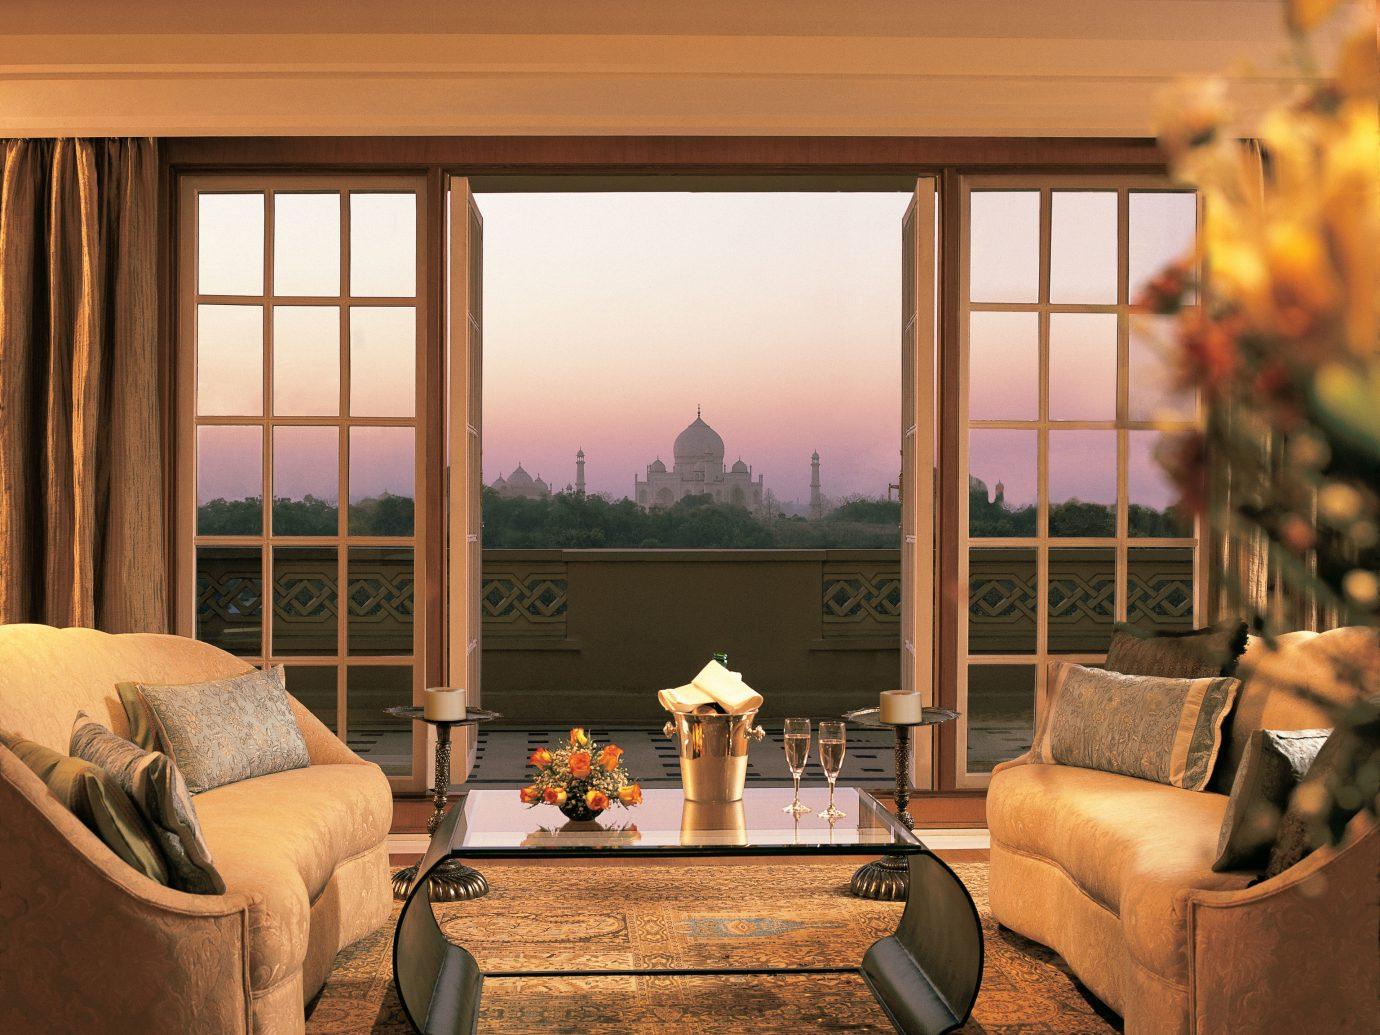 Hotels Luxury Travel indoor sofa room window property living room Living estate home interior design cottage Suite farmhouse furniture